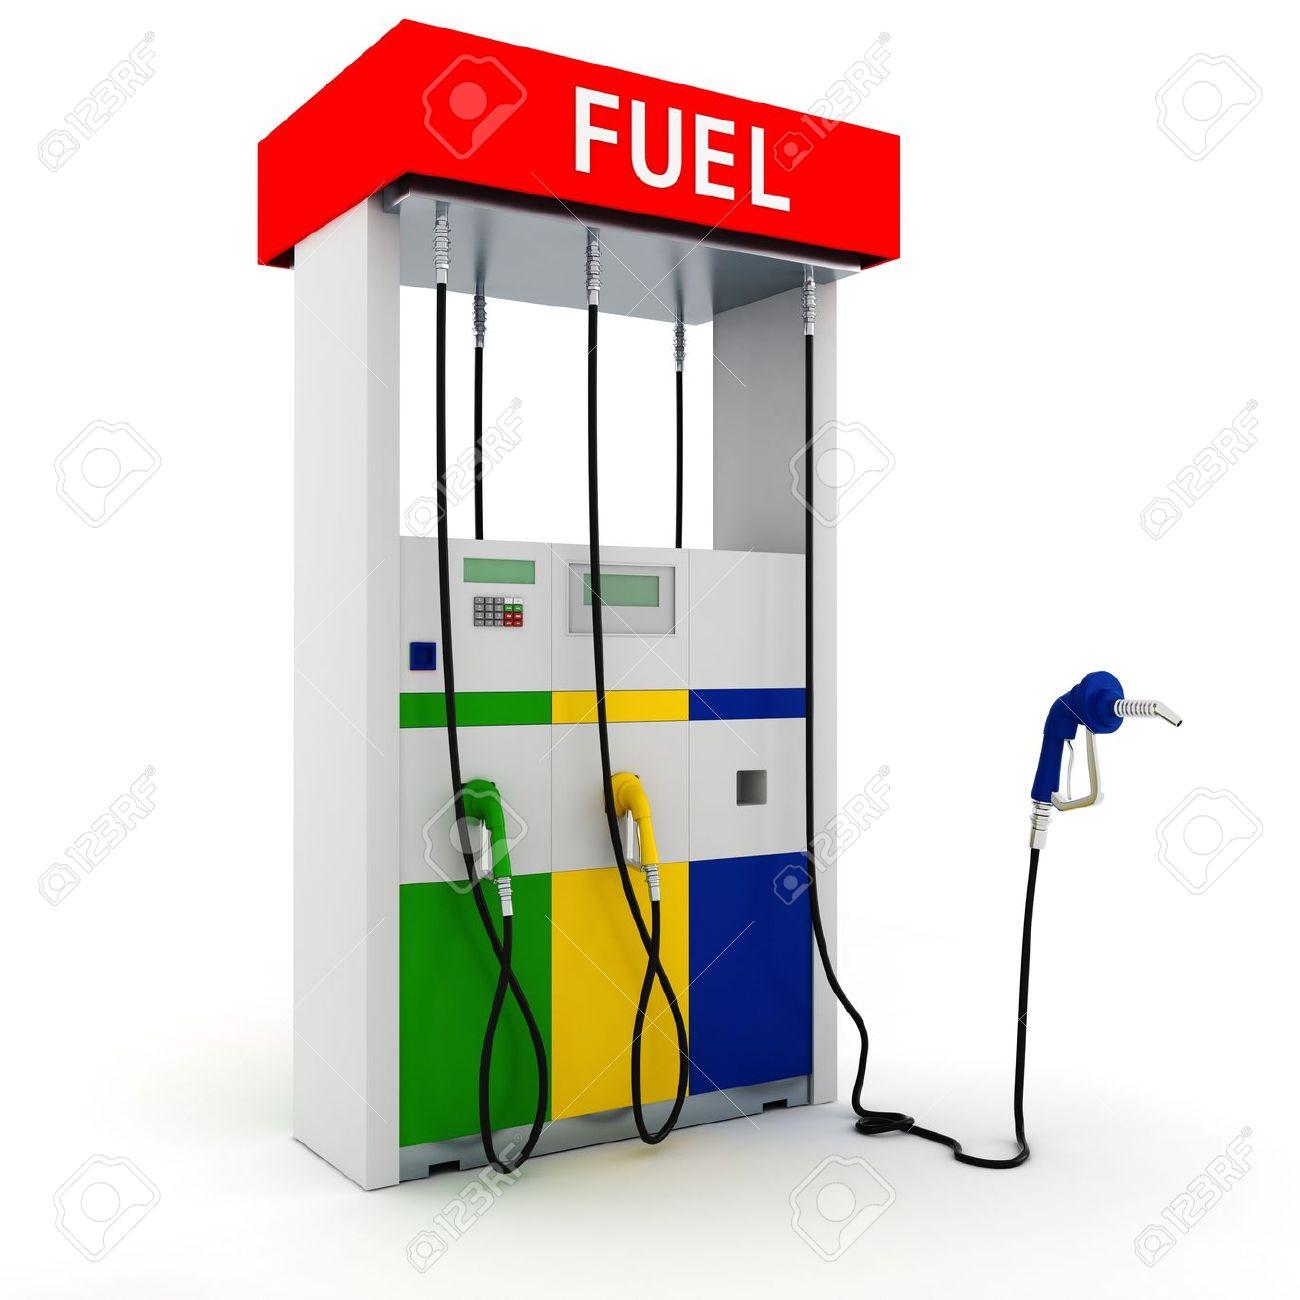 Gas station pump clipart.